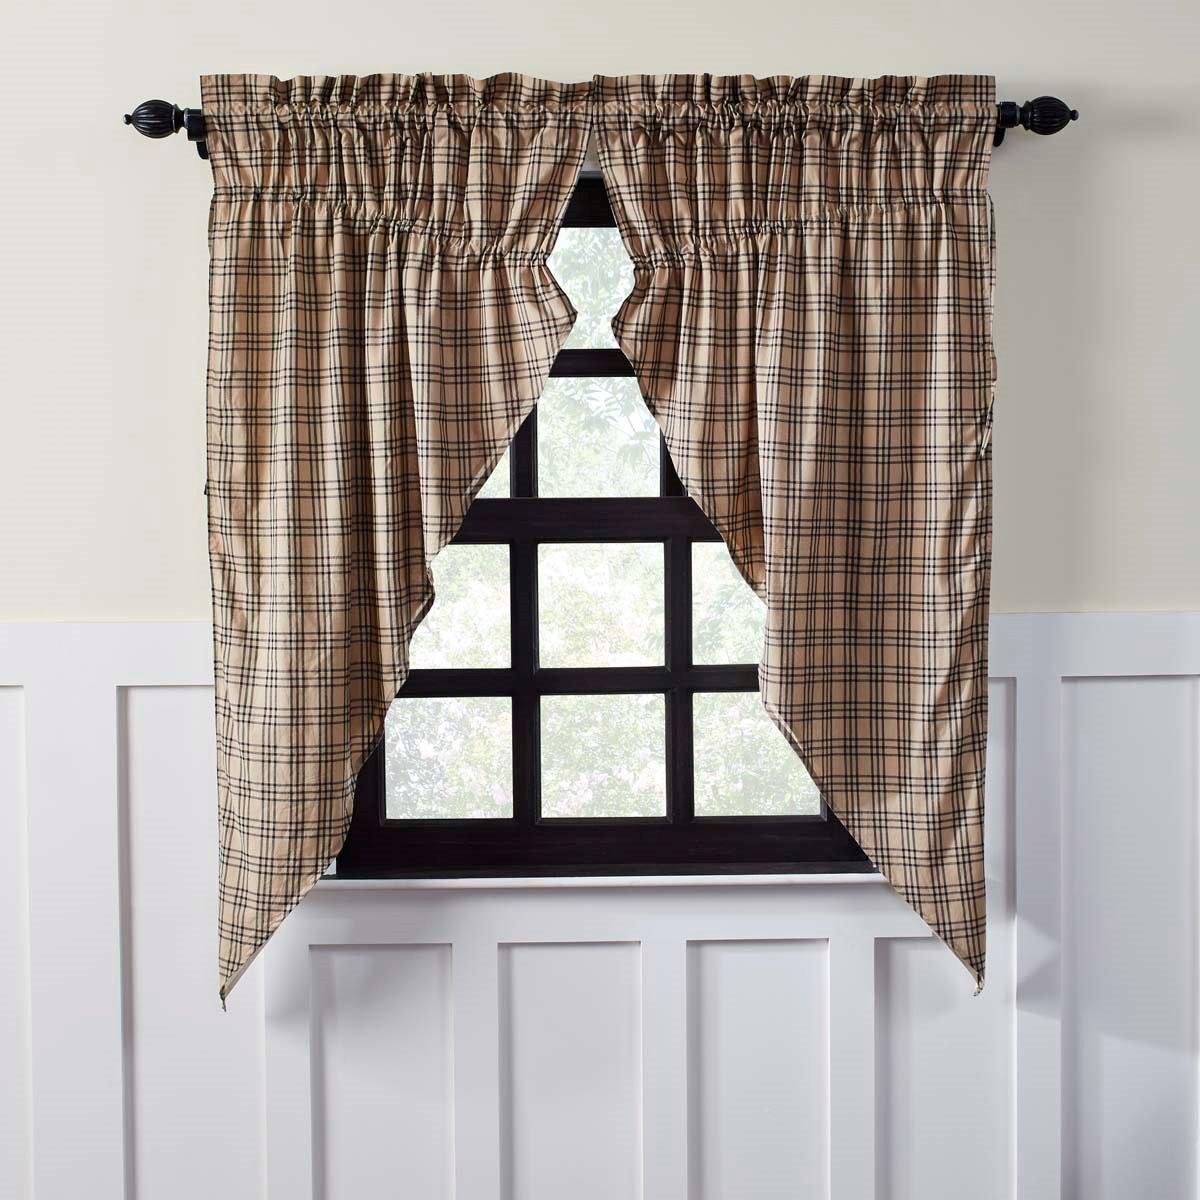 Sawyer Mill Prairie Curtain set of 2 (63L x 36W)